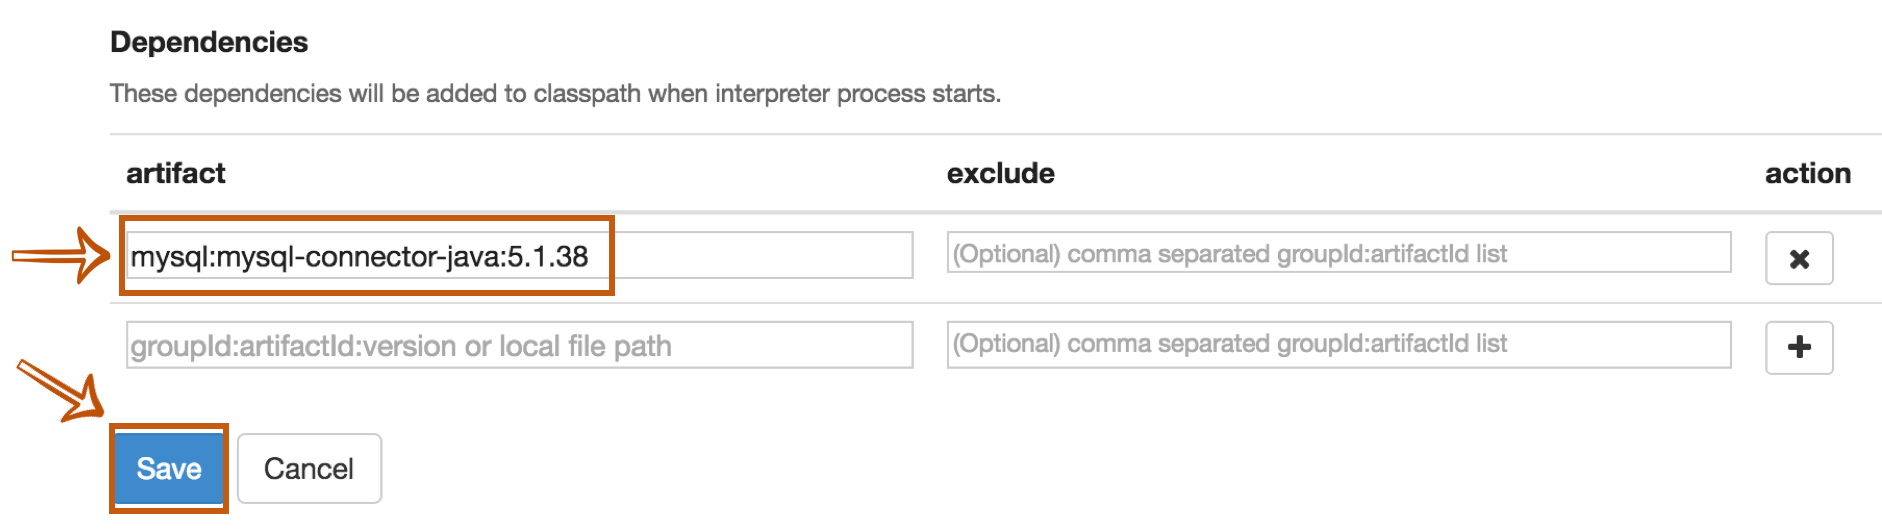 Apache Zeppelin 0 8 0 Documentation: Generic JDBC Interpreter for